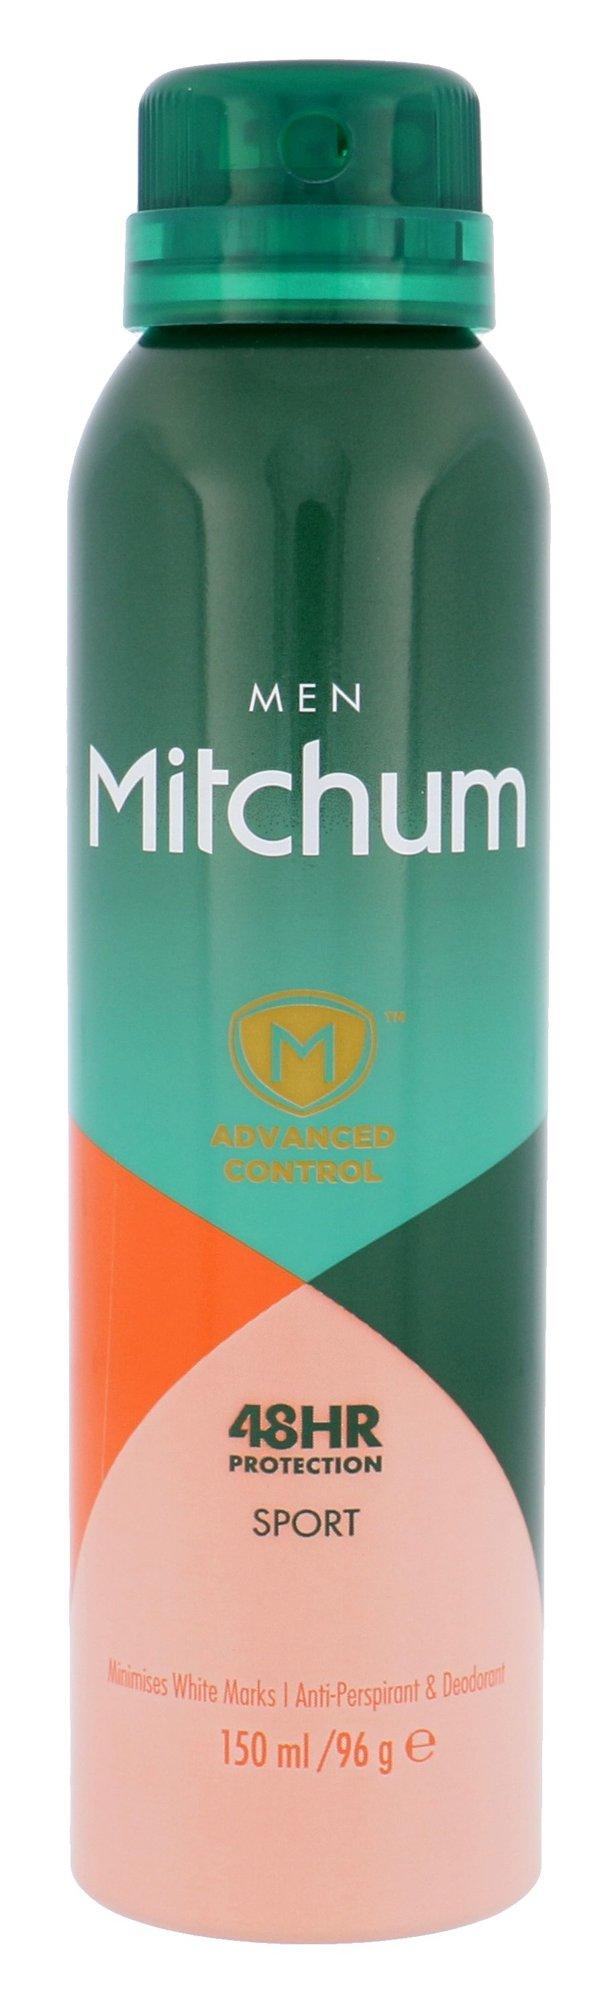 Mitchum Advanced Control Cosmetic 150ml  Sport